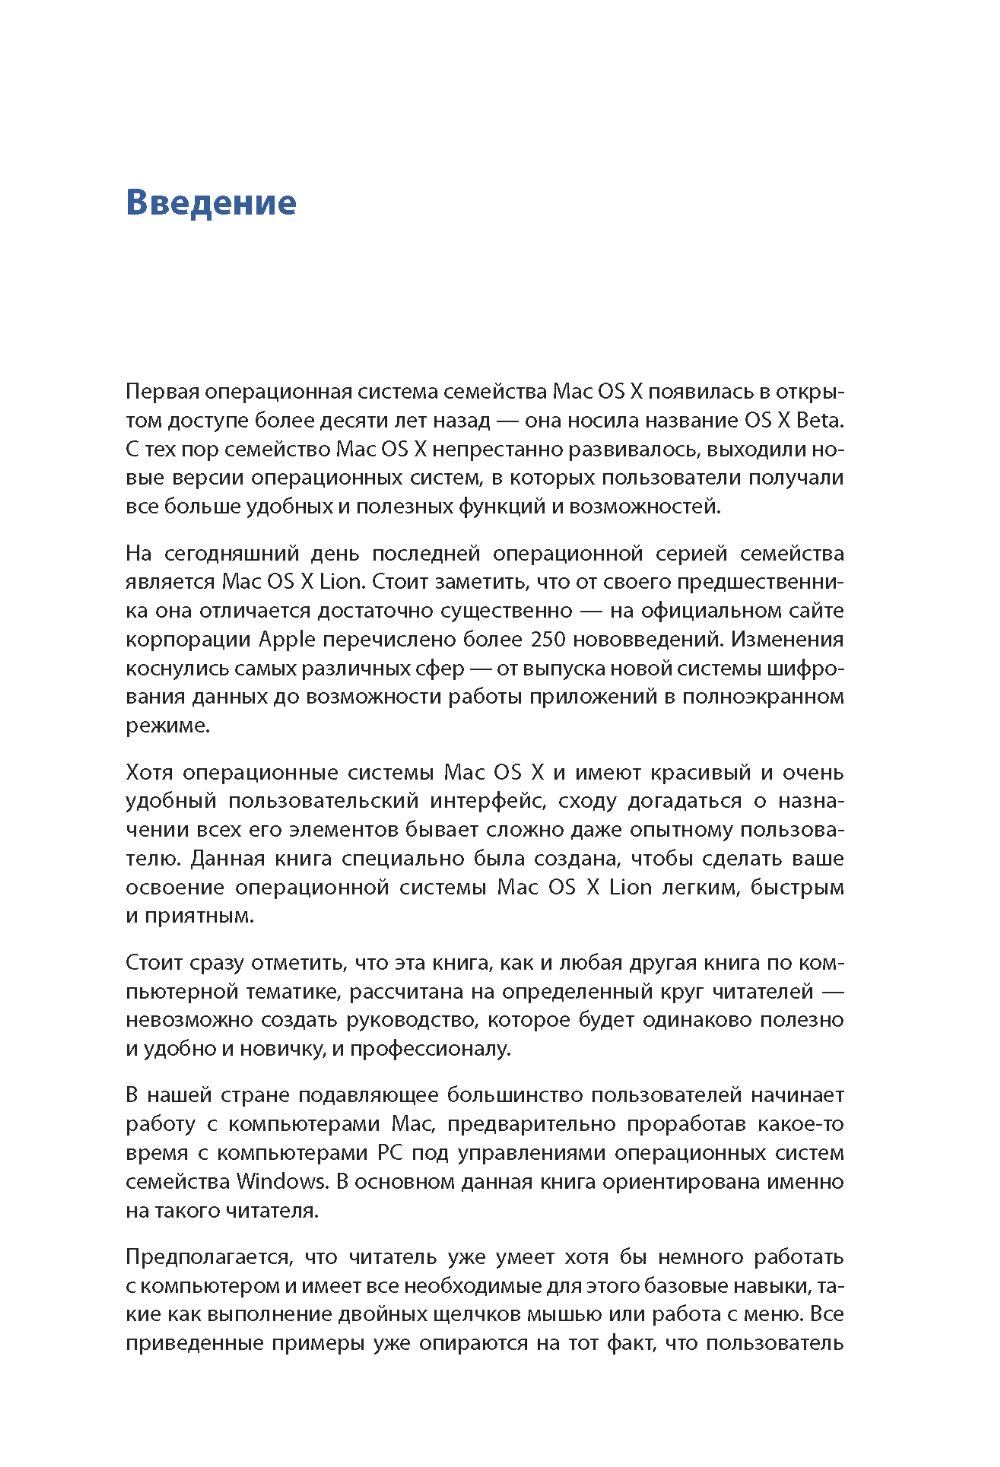 http://i2.imageban.ru/out/2013/12/13/655fb23fd372811c212dcfd524f579d8.jpg